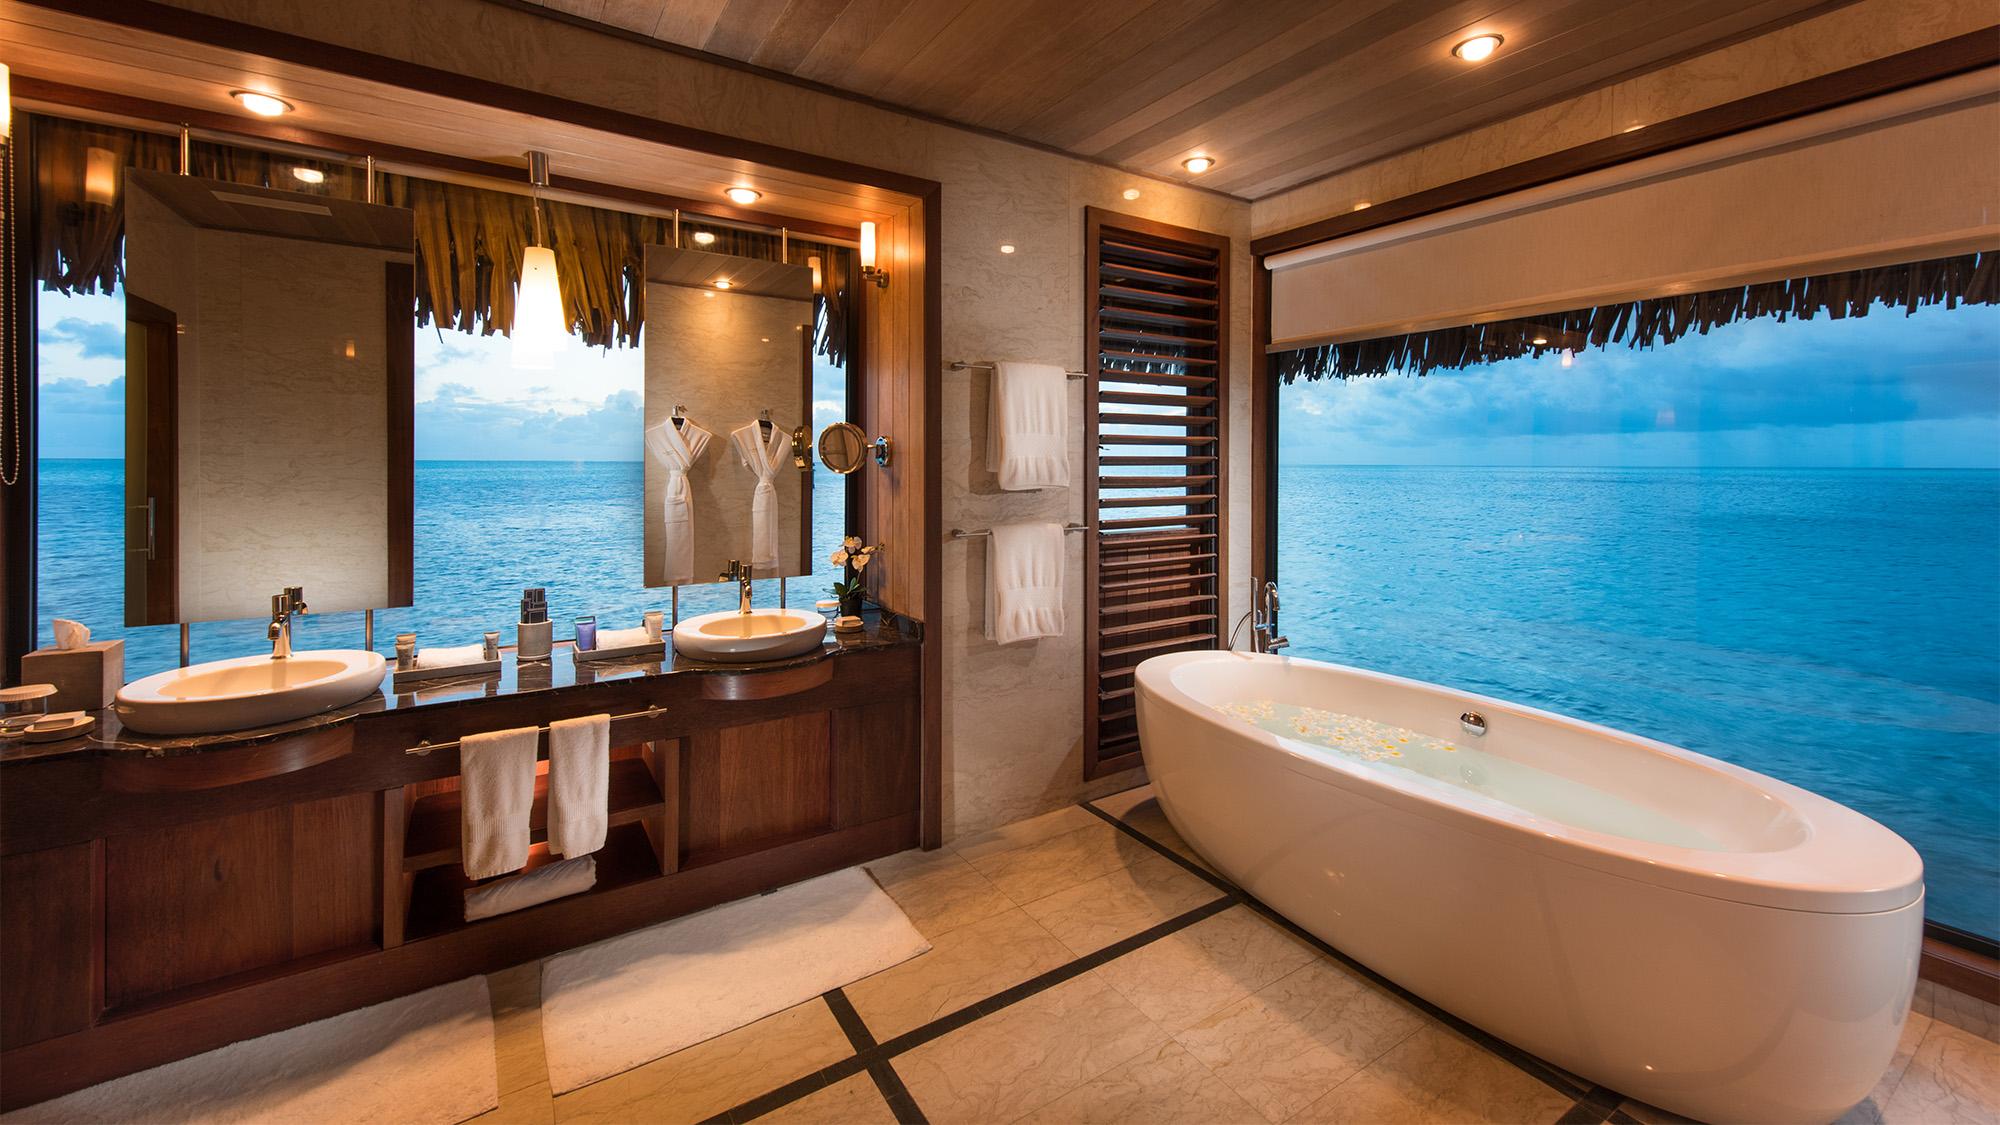 Conrad resort opens in Bora Bora: Travel Weekly